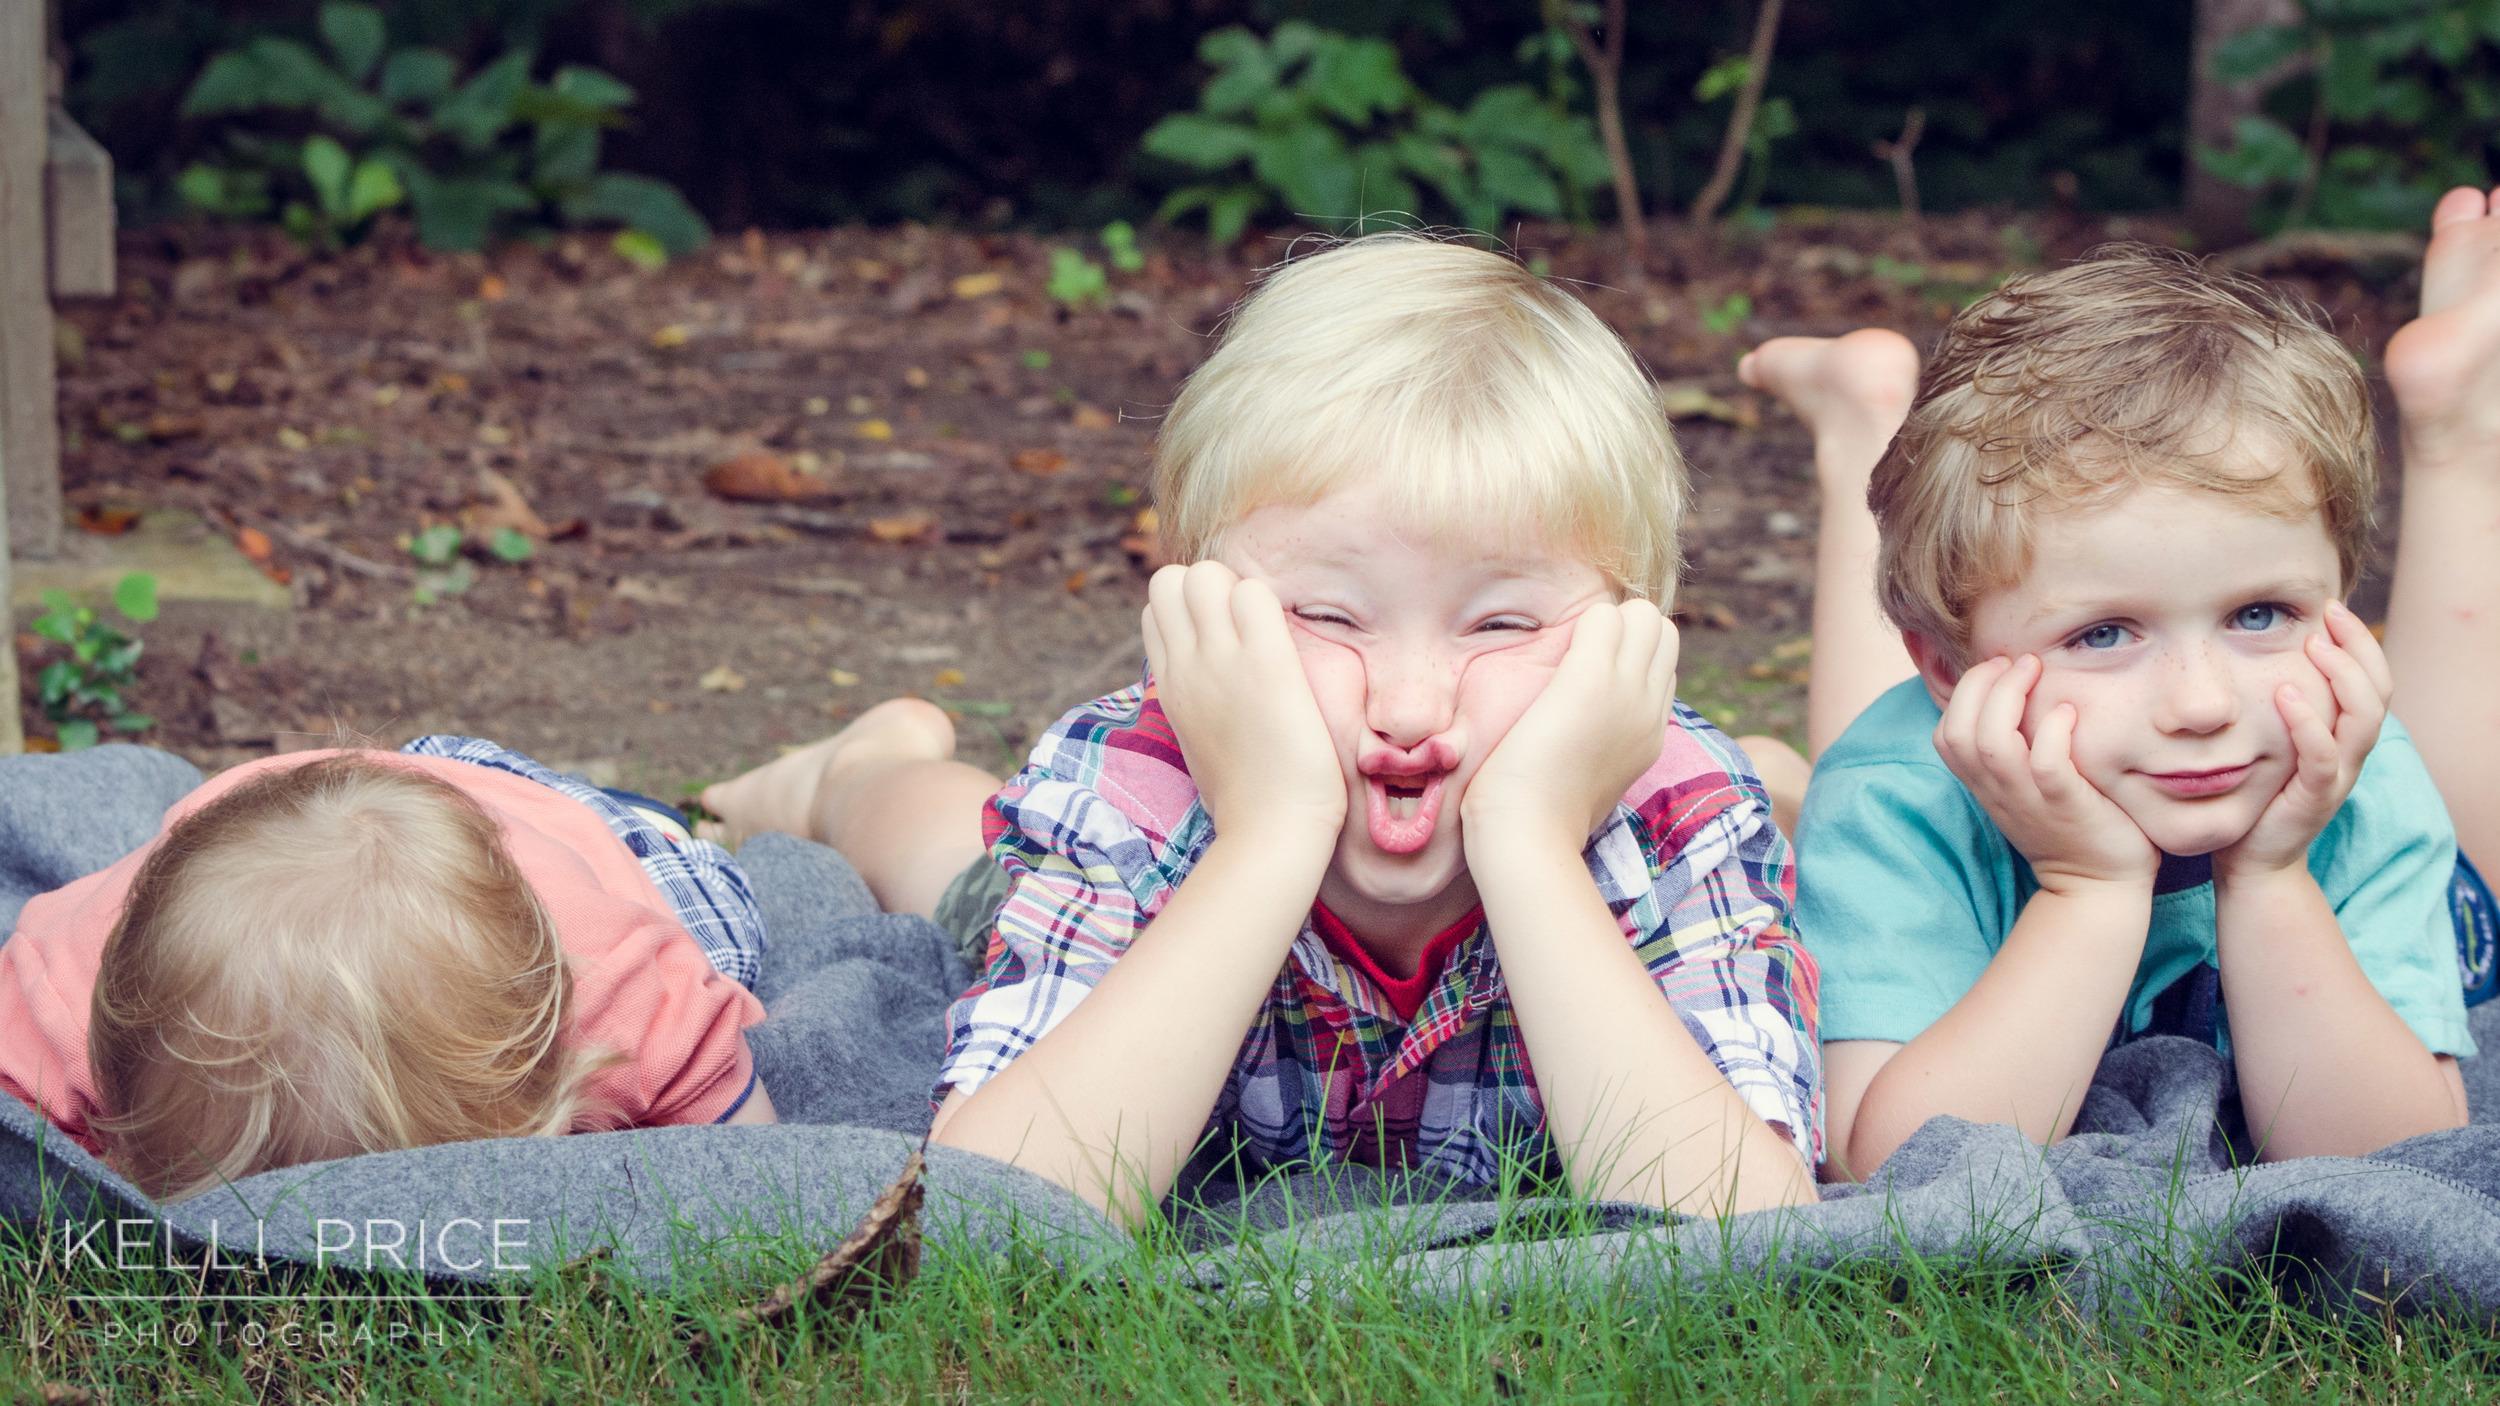 Bloopers11KelliPricePhotography.jpg